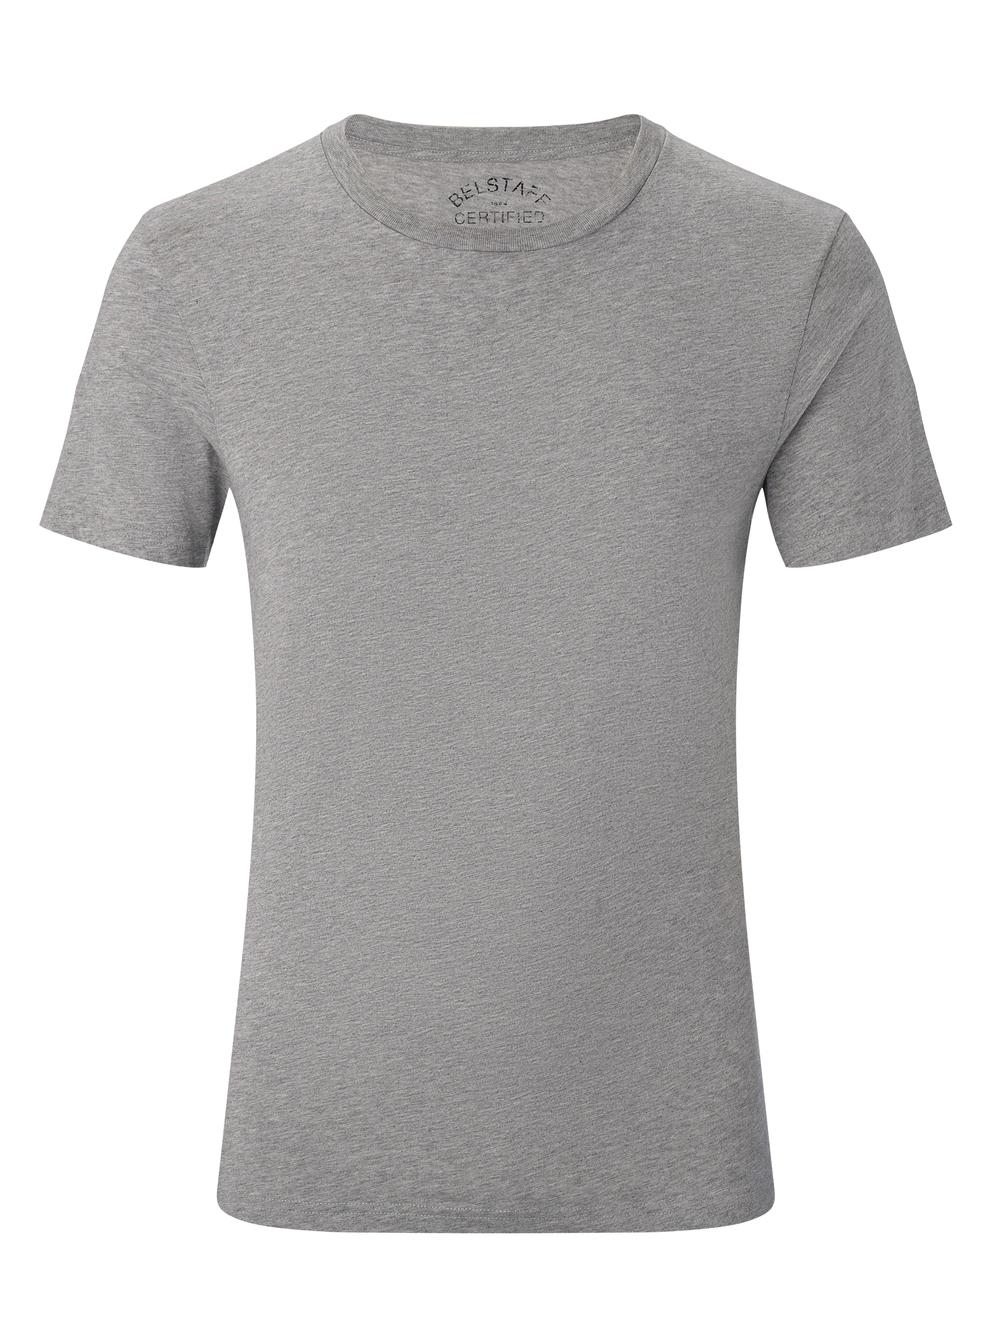 Beckham for Belstaff_Fornham T-Shirt_Grey Melange_1.jpg